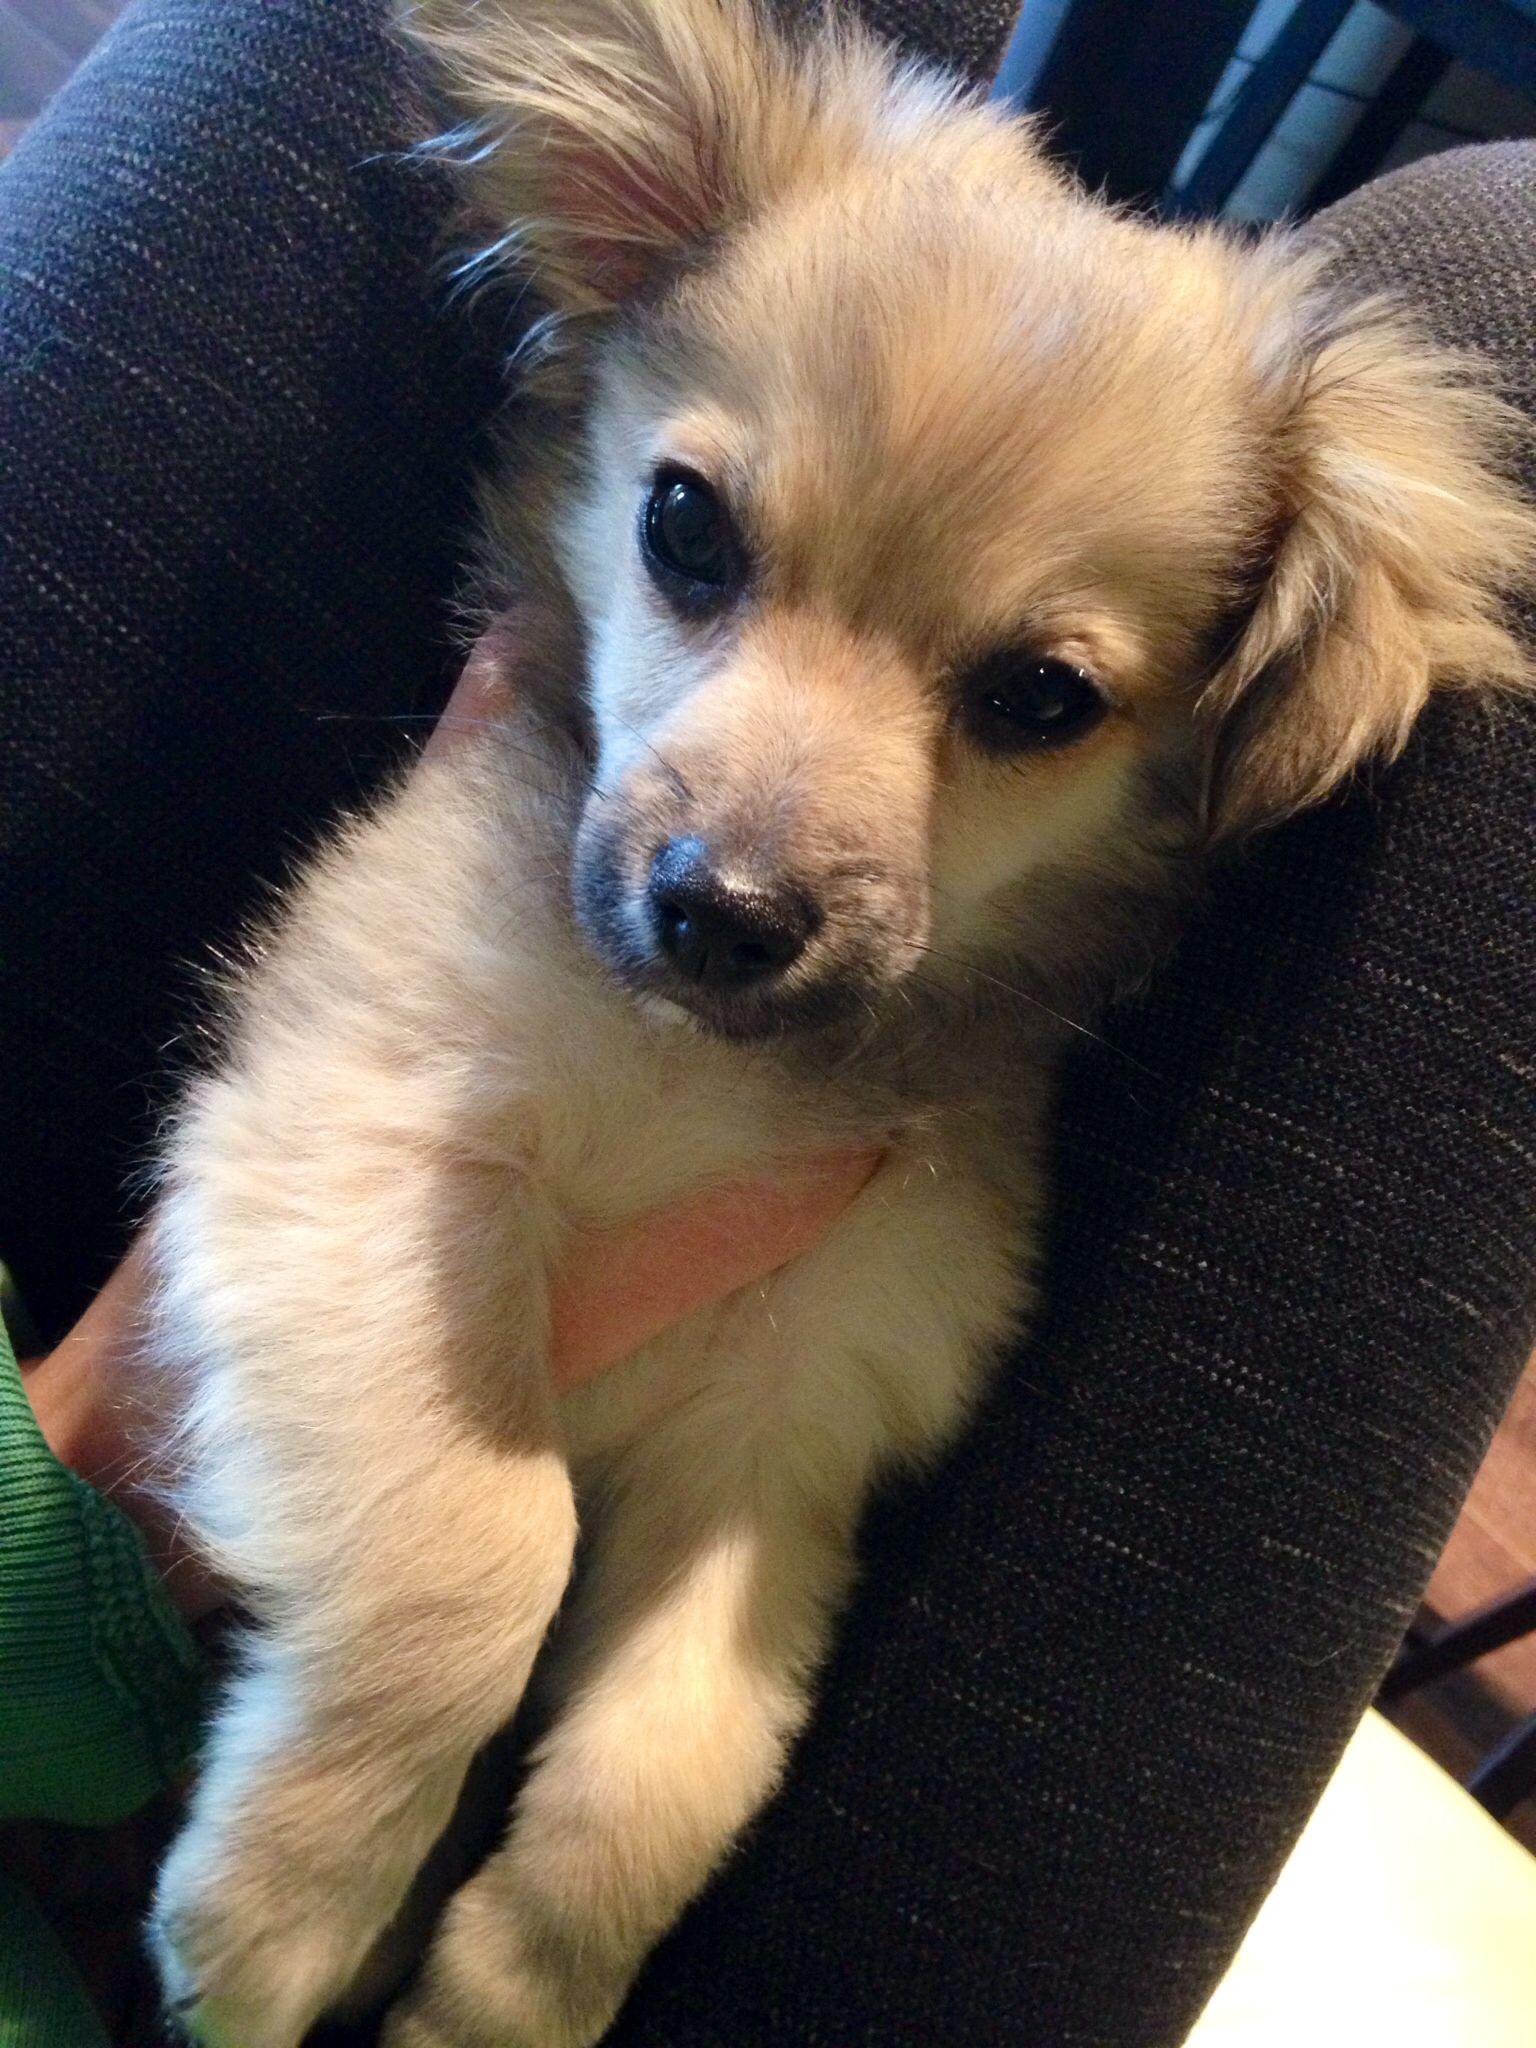 Mini Pomapoo Half Pomeranian Half Toy Poodle Pets Puppies Animals